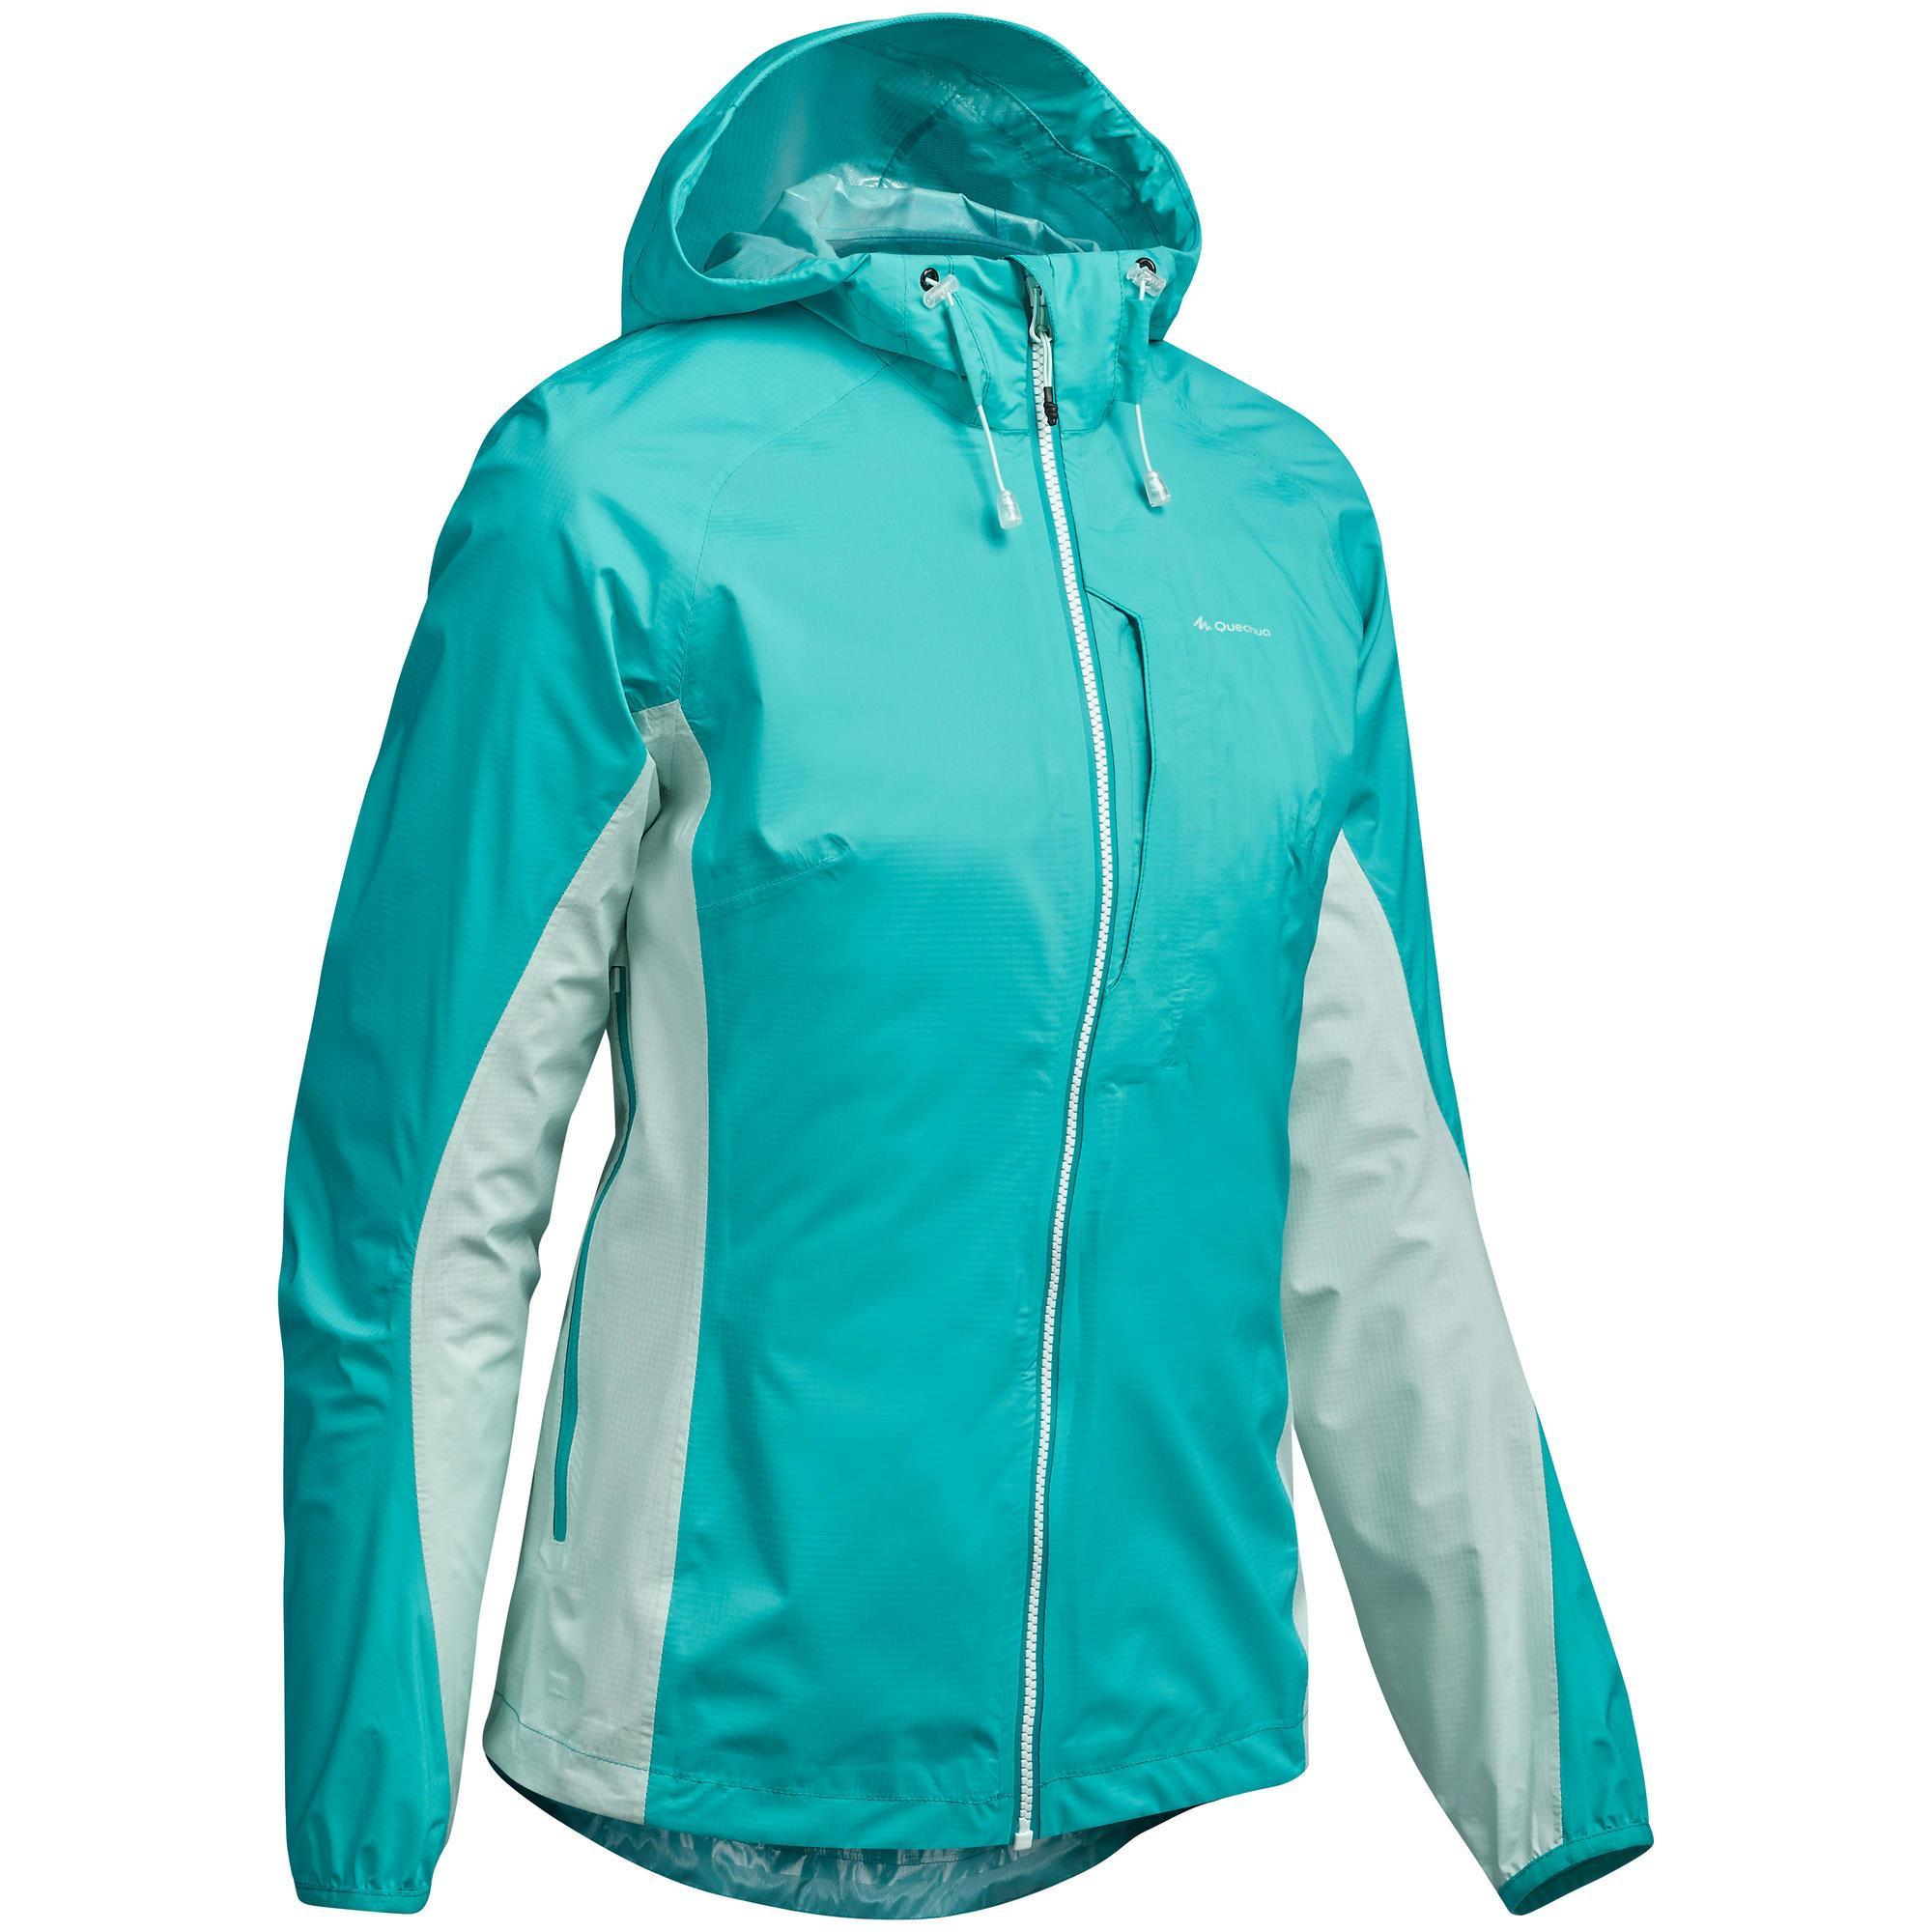 Regenjacke Speed Hiking FH500 Helium Rain Damen | Sportbekleidung > Sportjacken > Regenjacken | Quechua